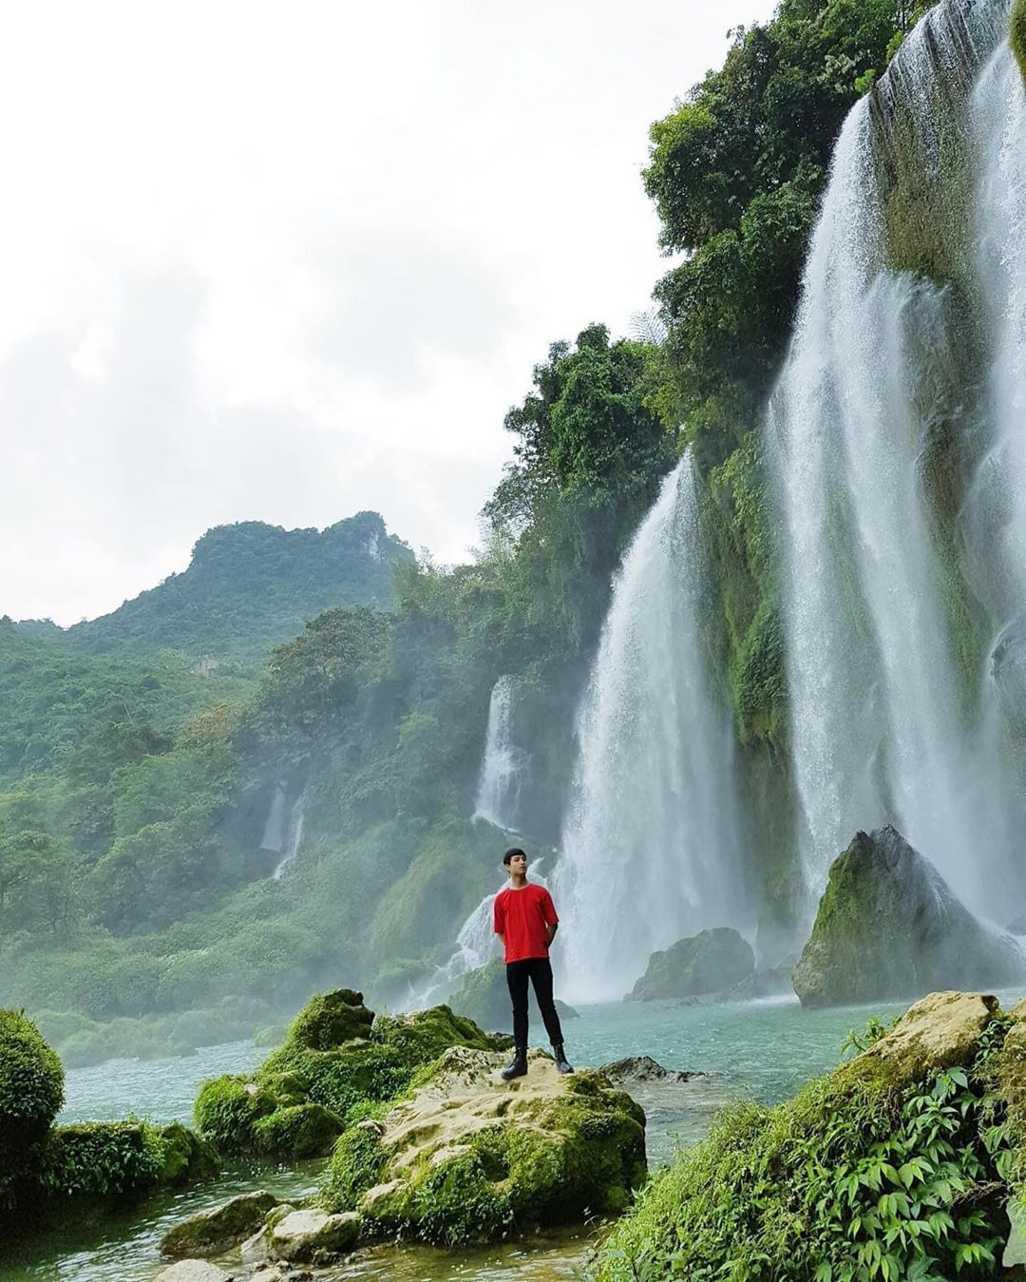 vietnam waterfalls - ban gioc waterfall 3